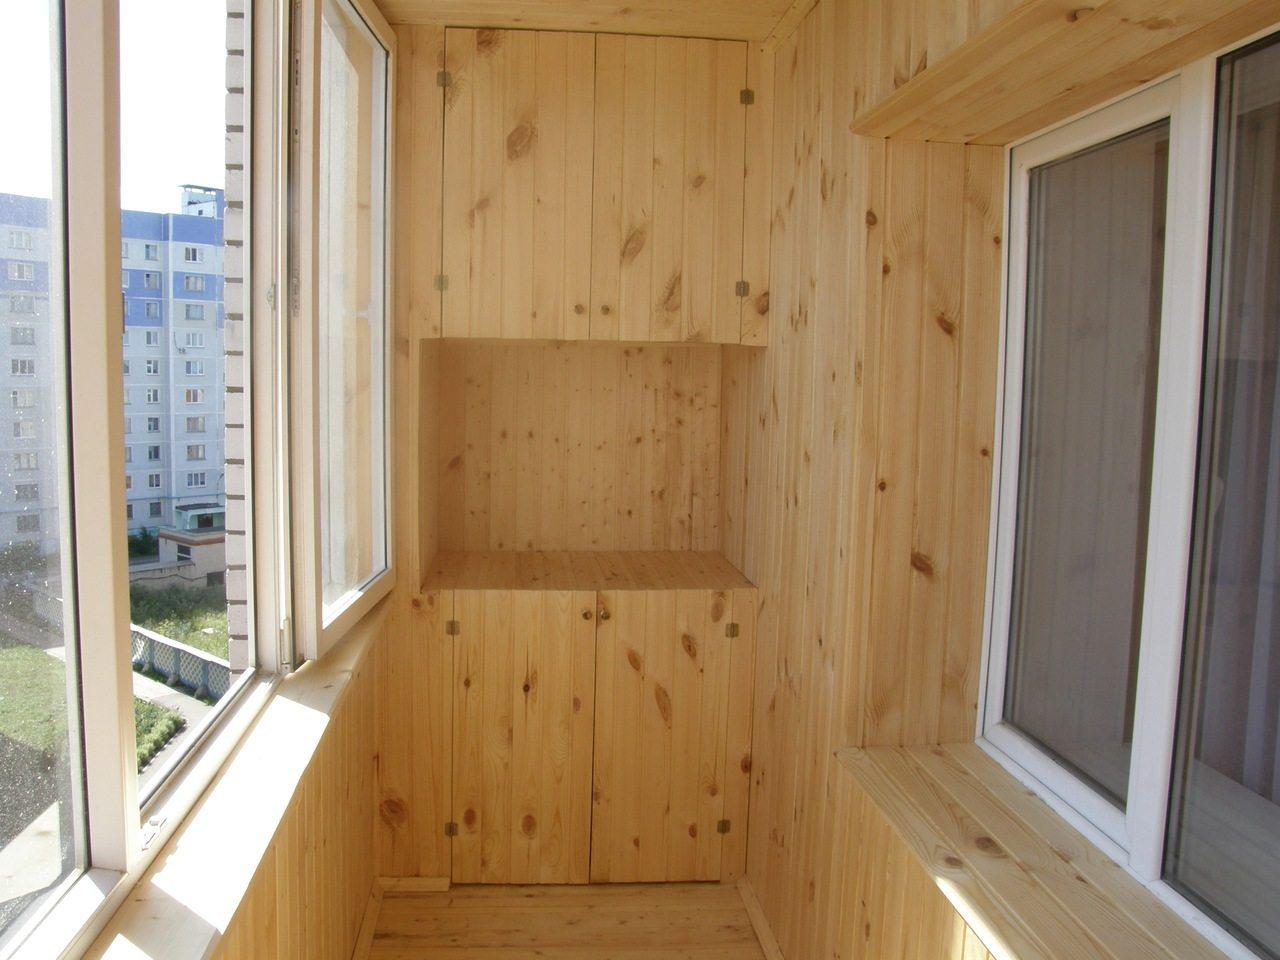 Отделка балкона внутри пластиковыми панелями и другими матер.